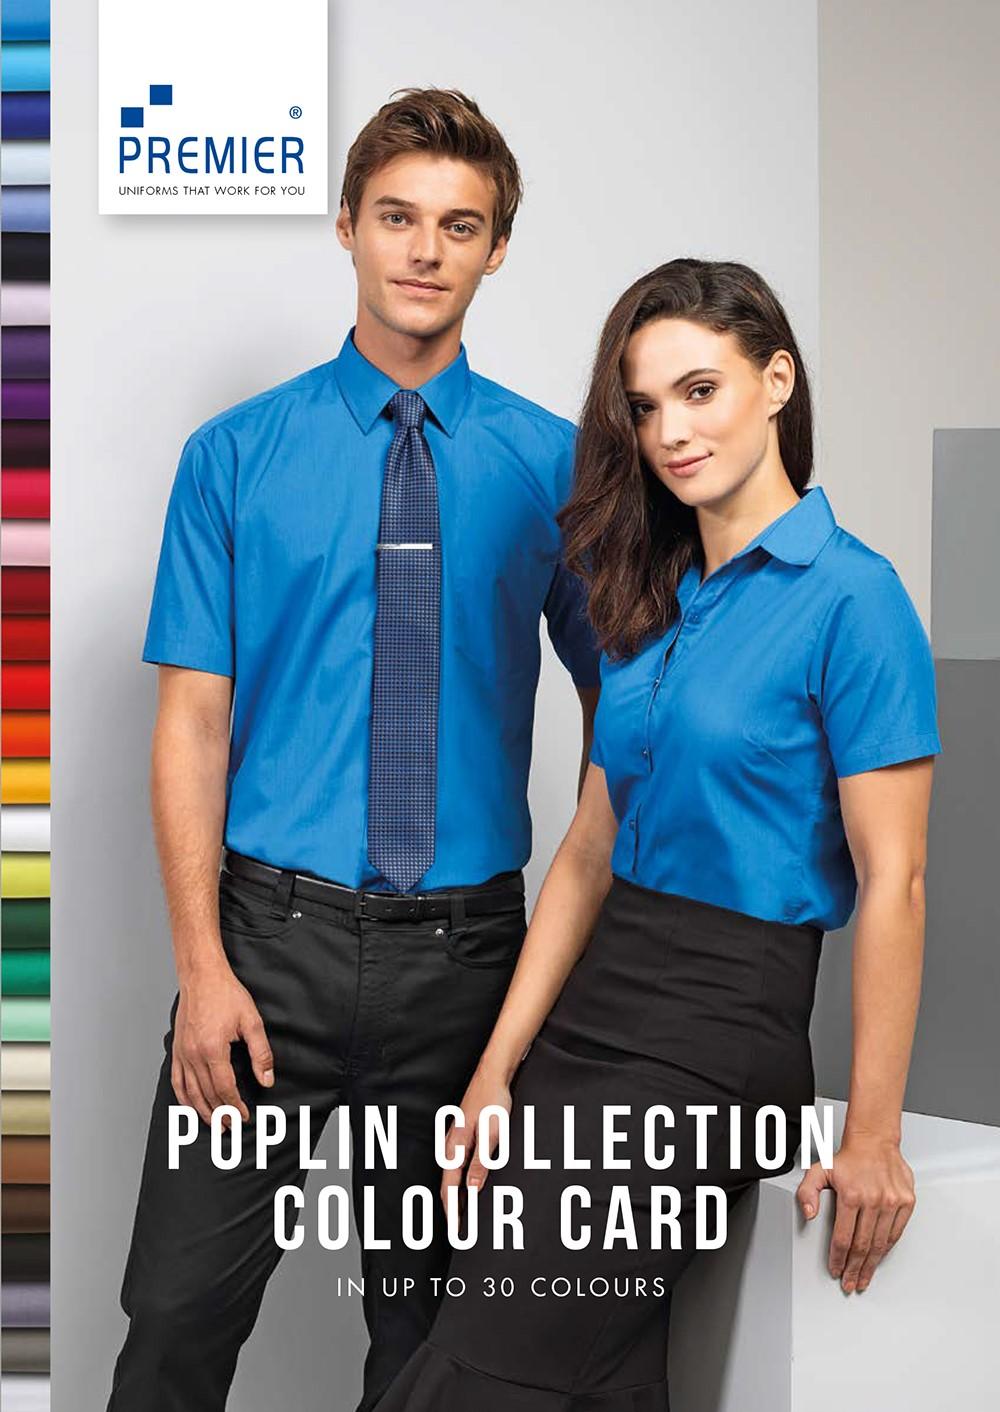 Barevnice popelínové košile